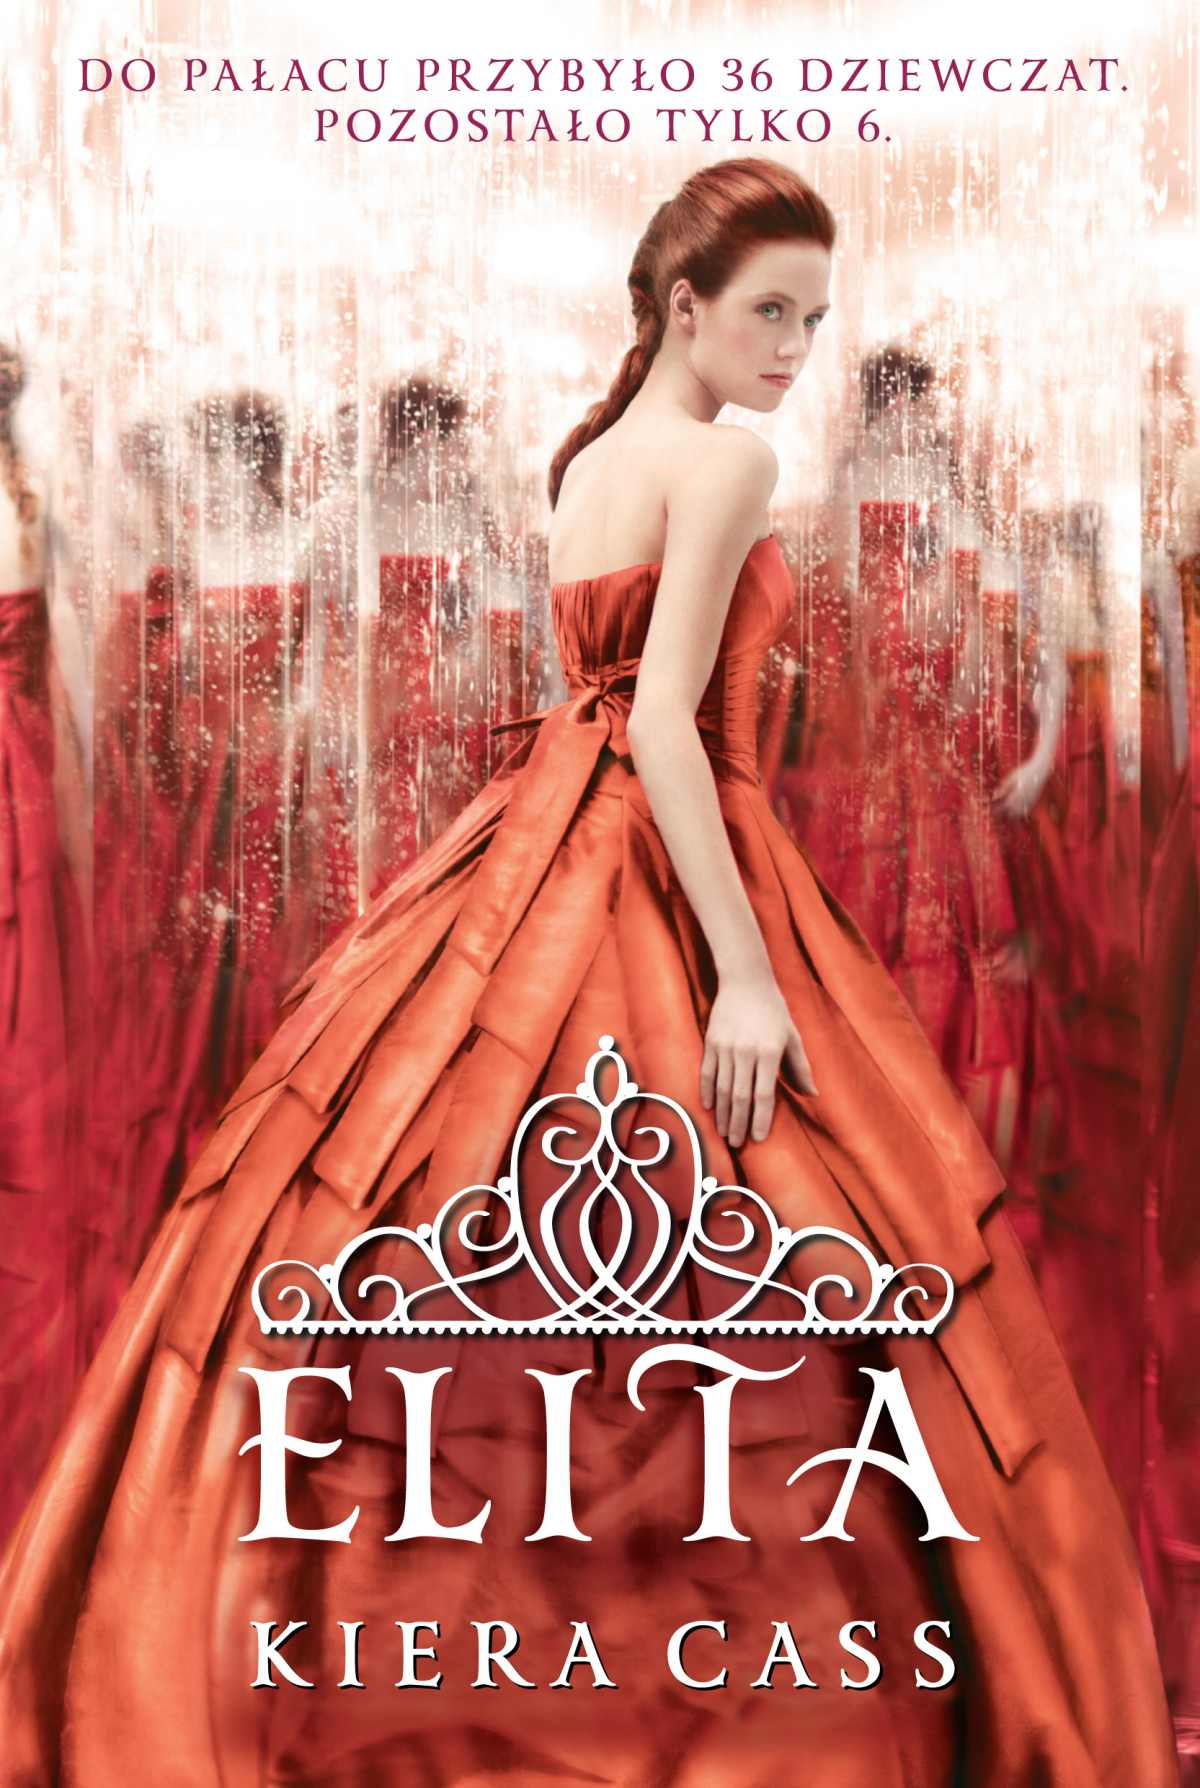 Elita - Ebook (Książka na Kindle) do pobrania w formacie MOBI